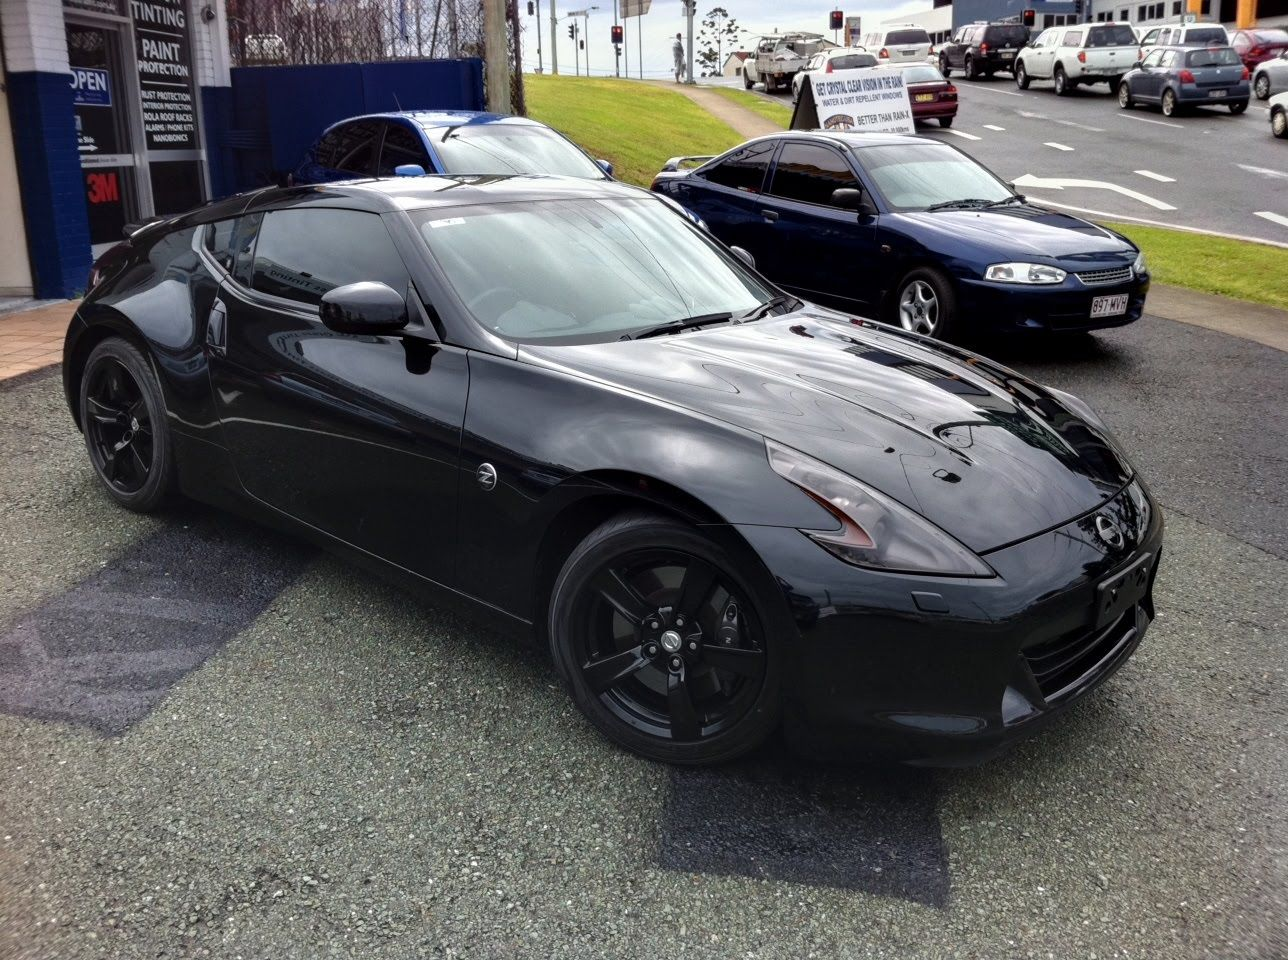 Mccarthy call a car new nissan 370z coupe 37 7 sp callacar black 370z vanachro Gallery